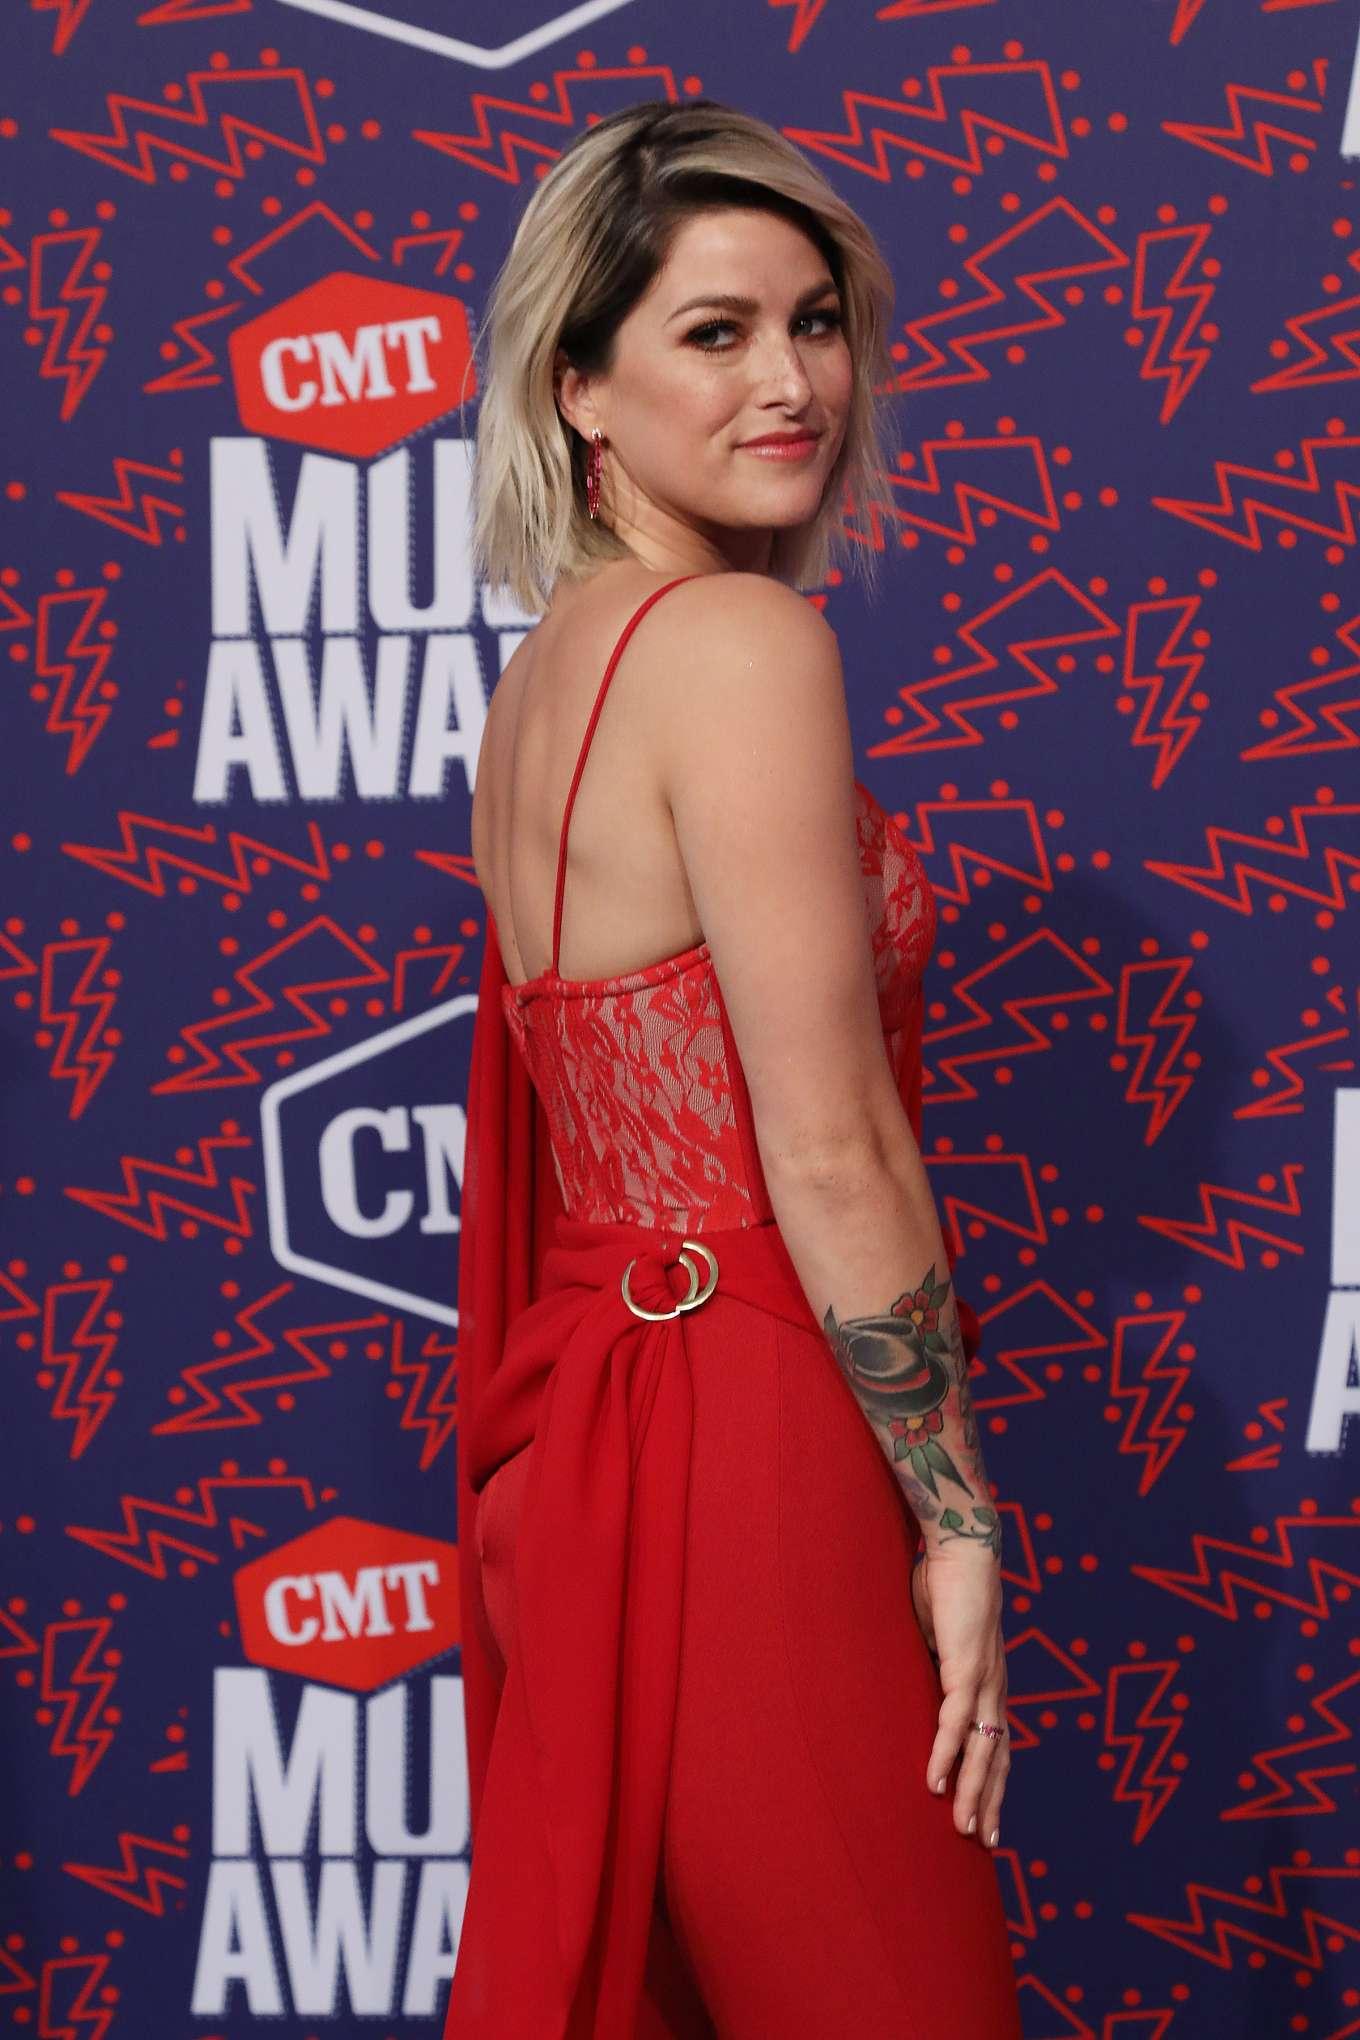 Cassadee Pope 2019 : Cassadee Pope: 2019 CMT Music Awards-27